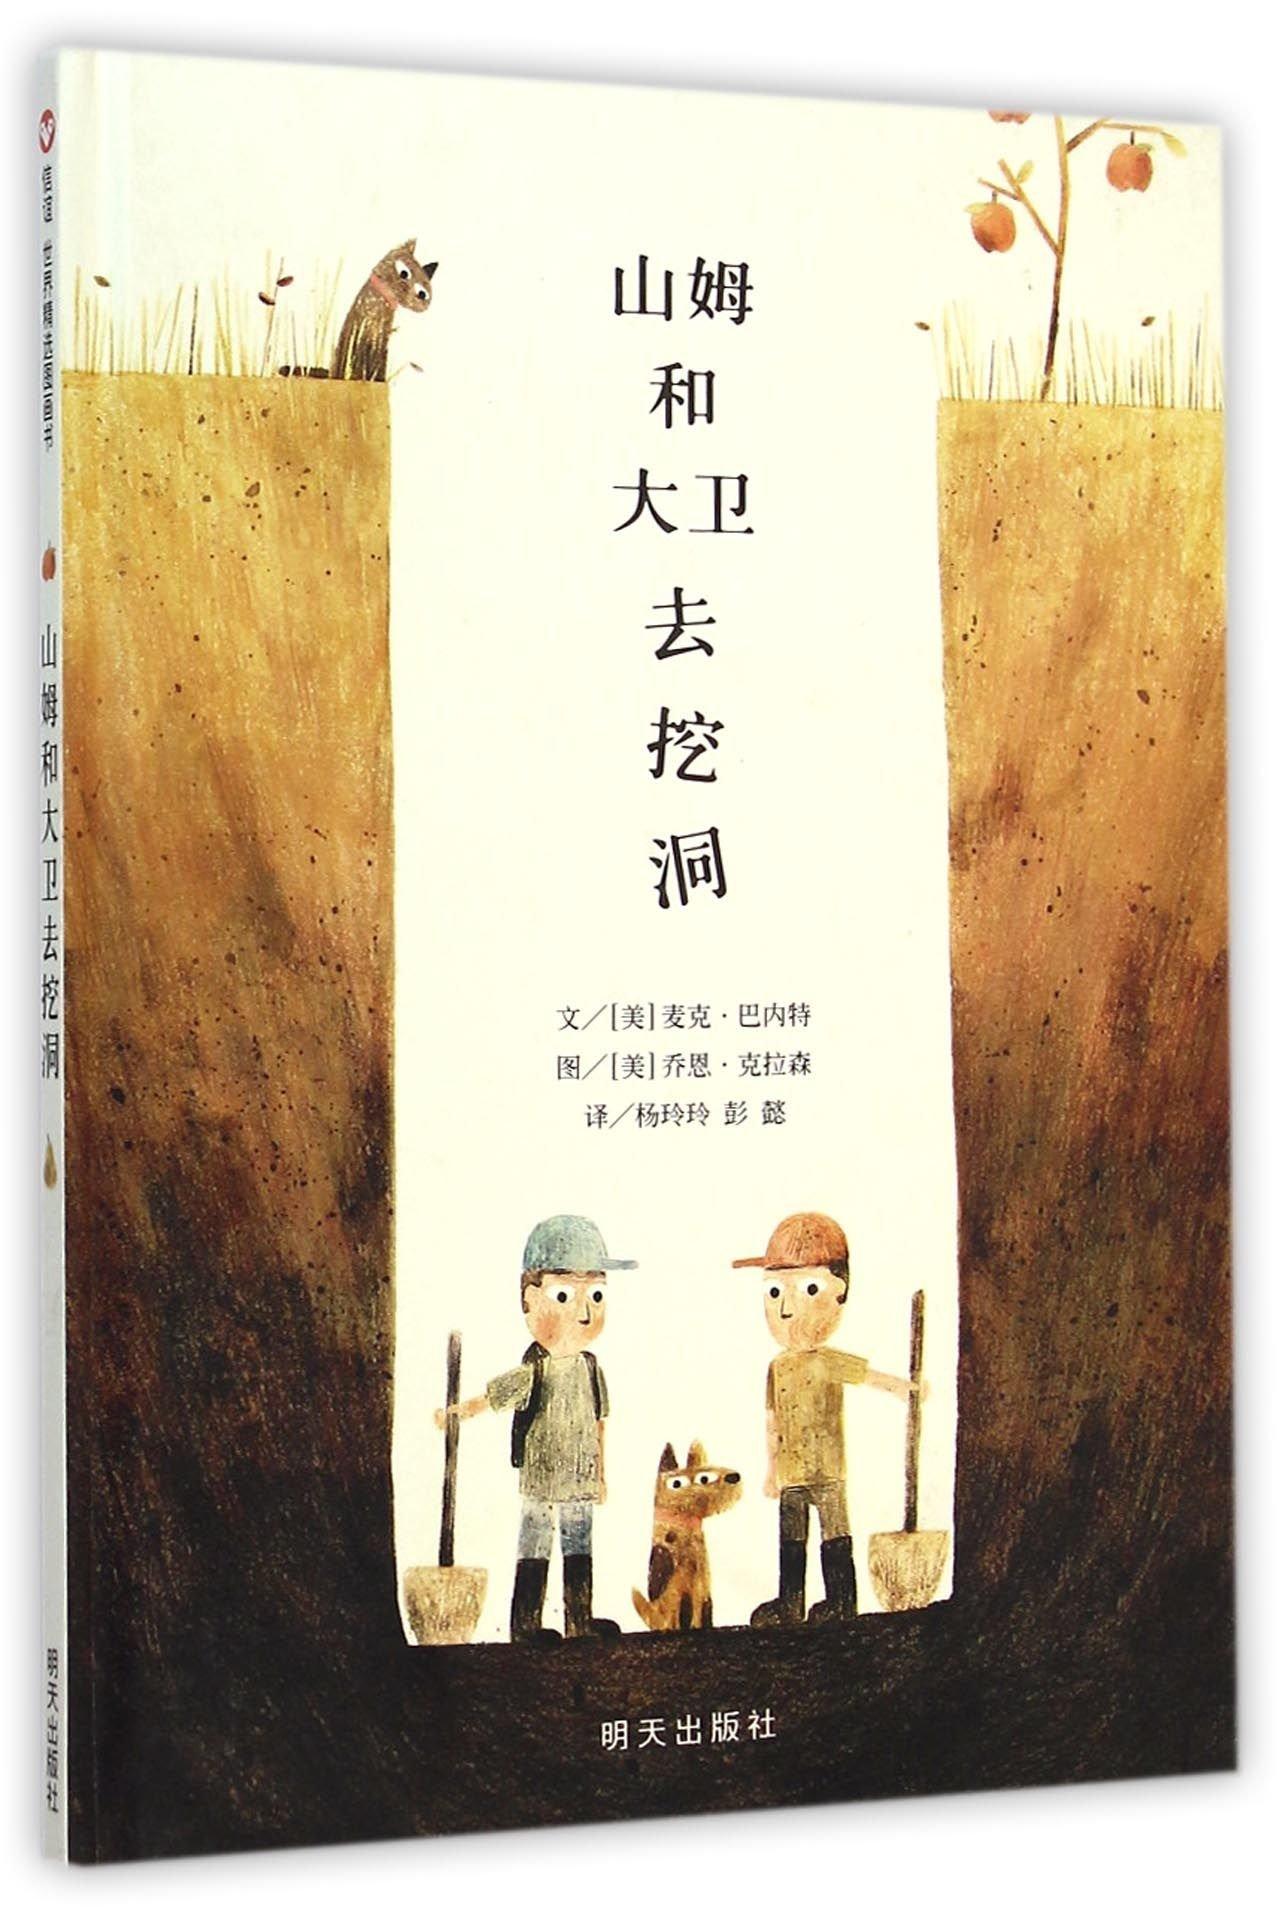 Sam & Dave Dig a Hole (Chinese Edition) pdf epub